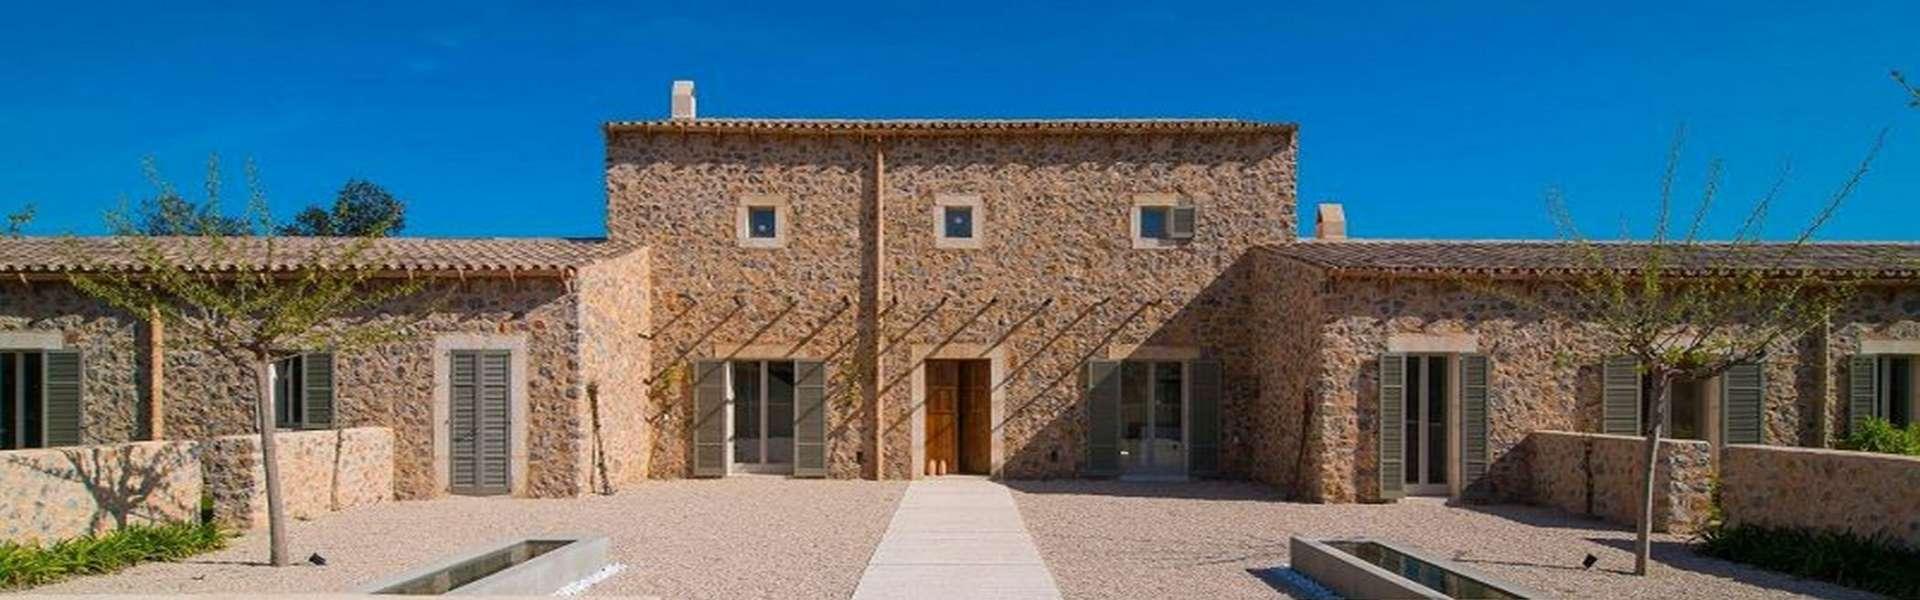 Santanyí - Schönes Grundstück mit genehmigtem Bauprojekt